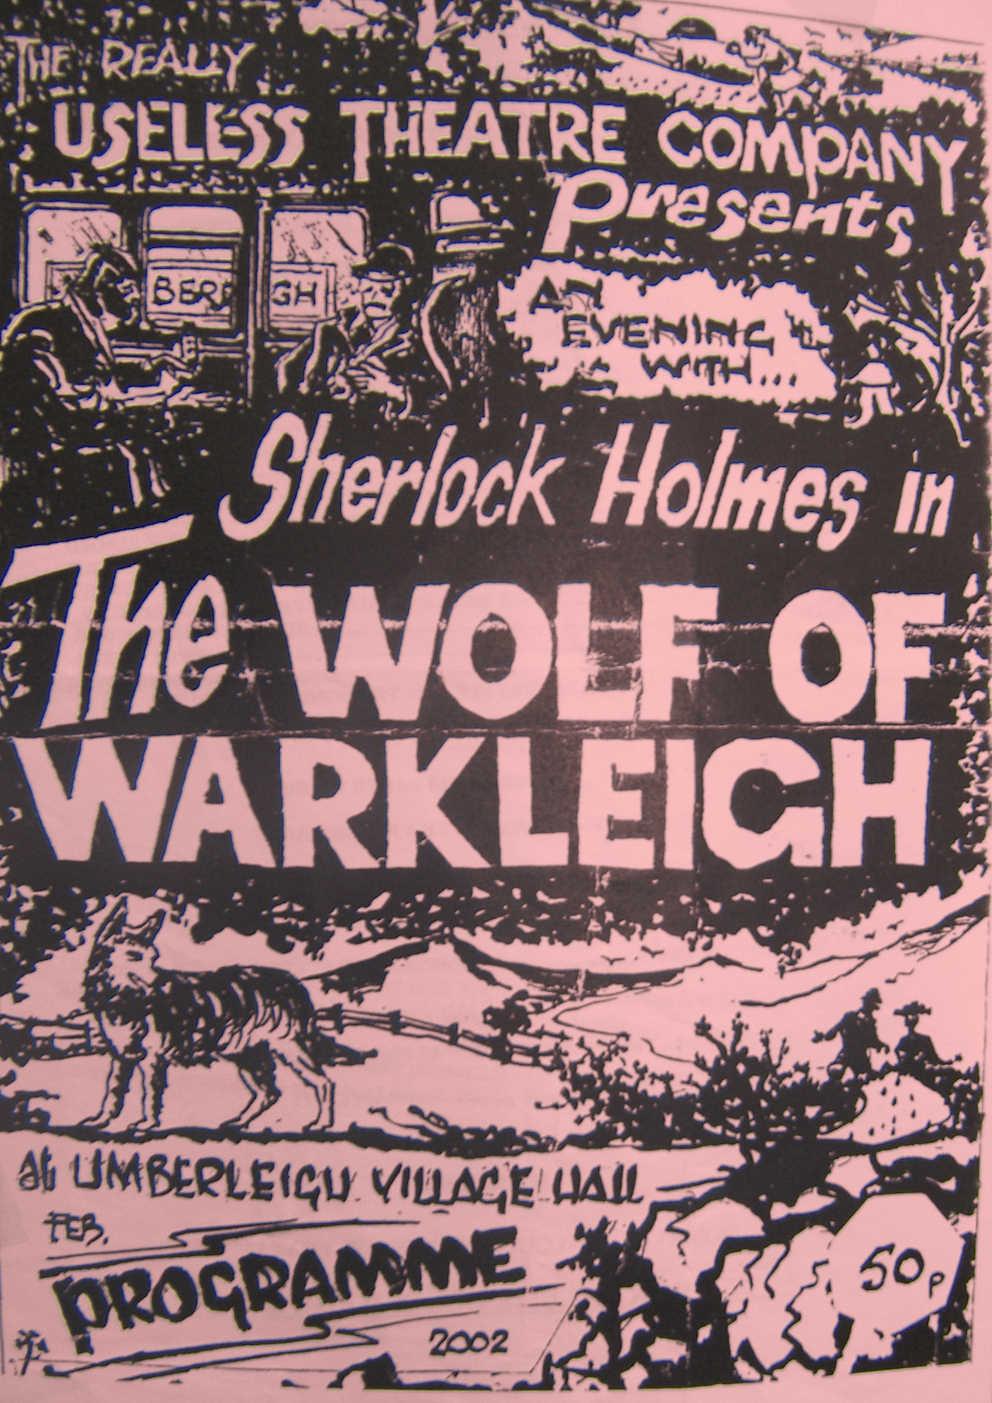 2002 Sherlock Holmes